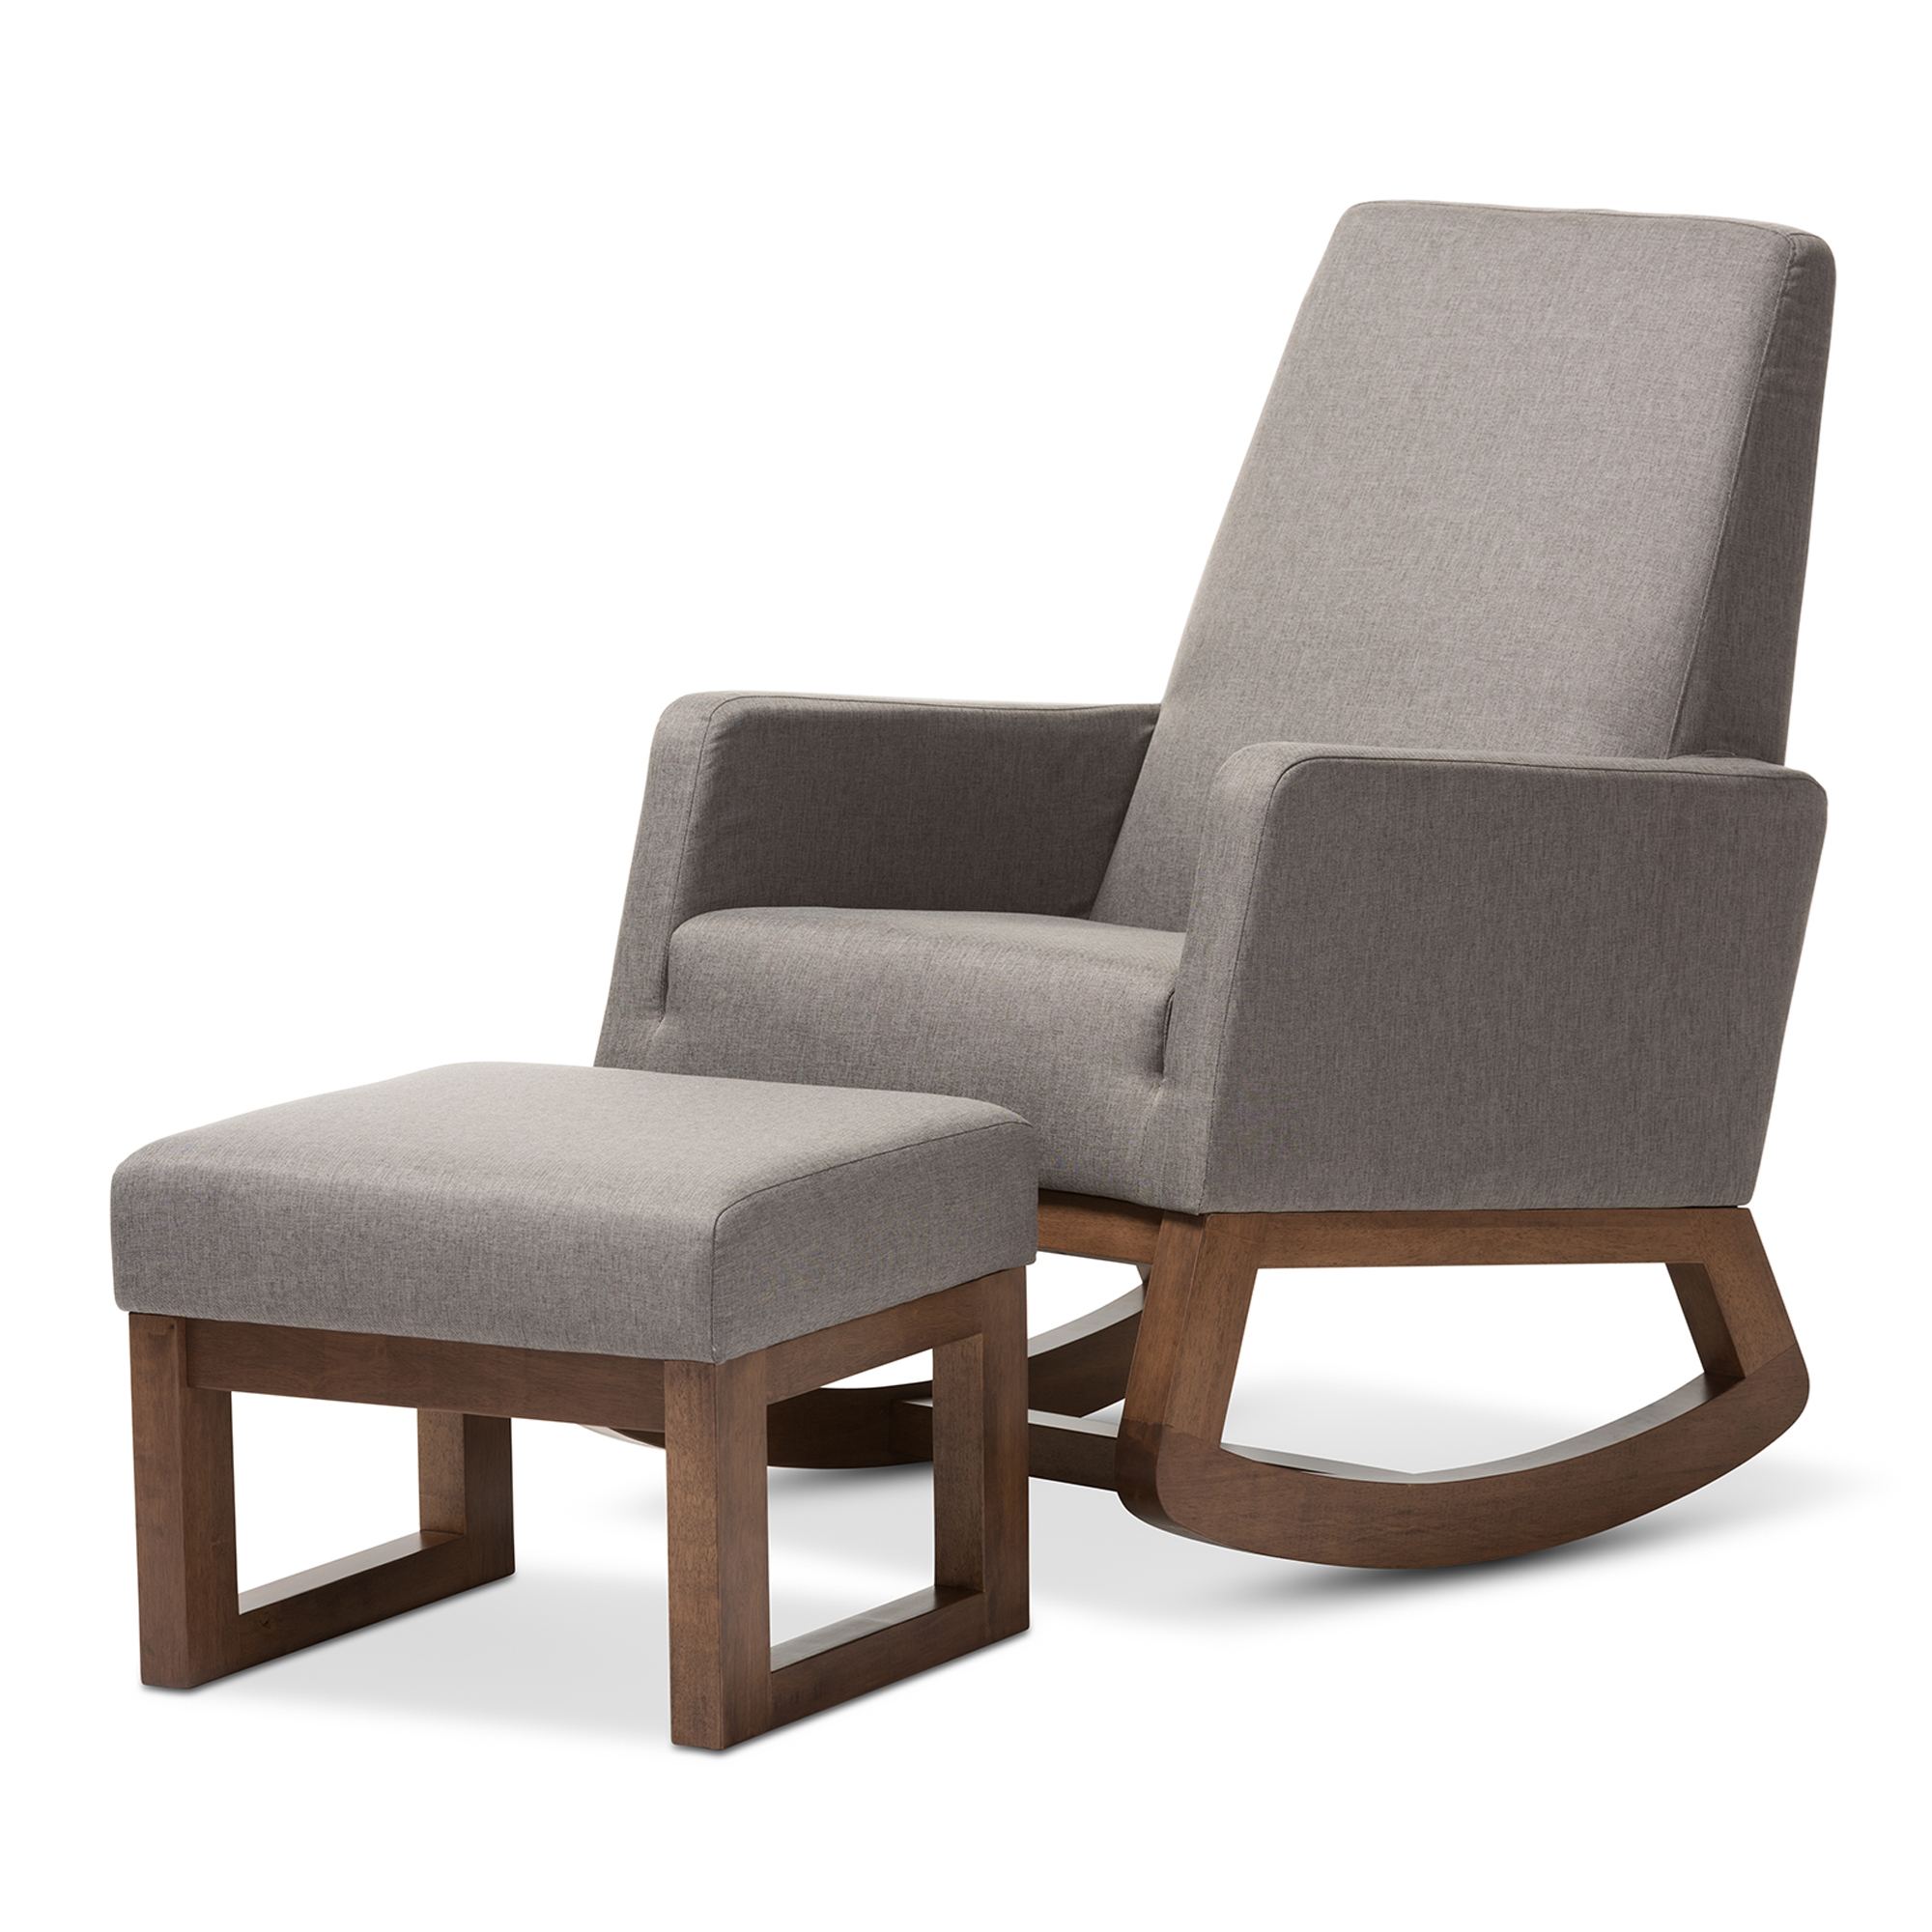 Baxton Studio Yashiya Mid Century Retro Modern Grey Fabric Upholstered Rocking  Chair And Ottoman Set